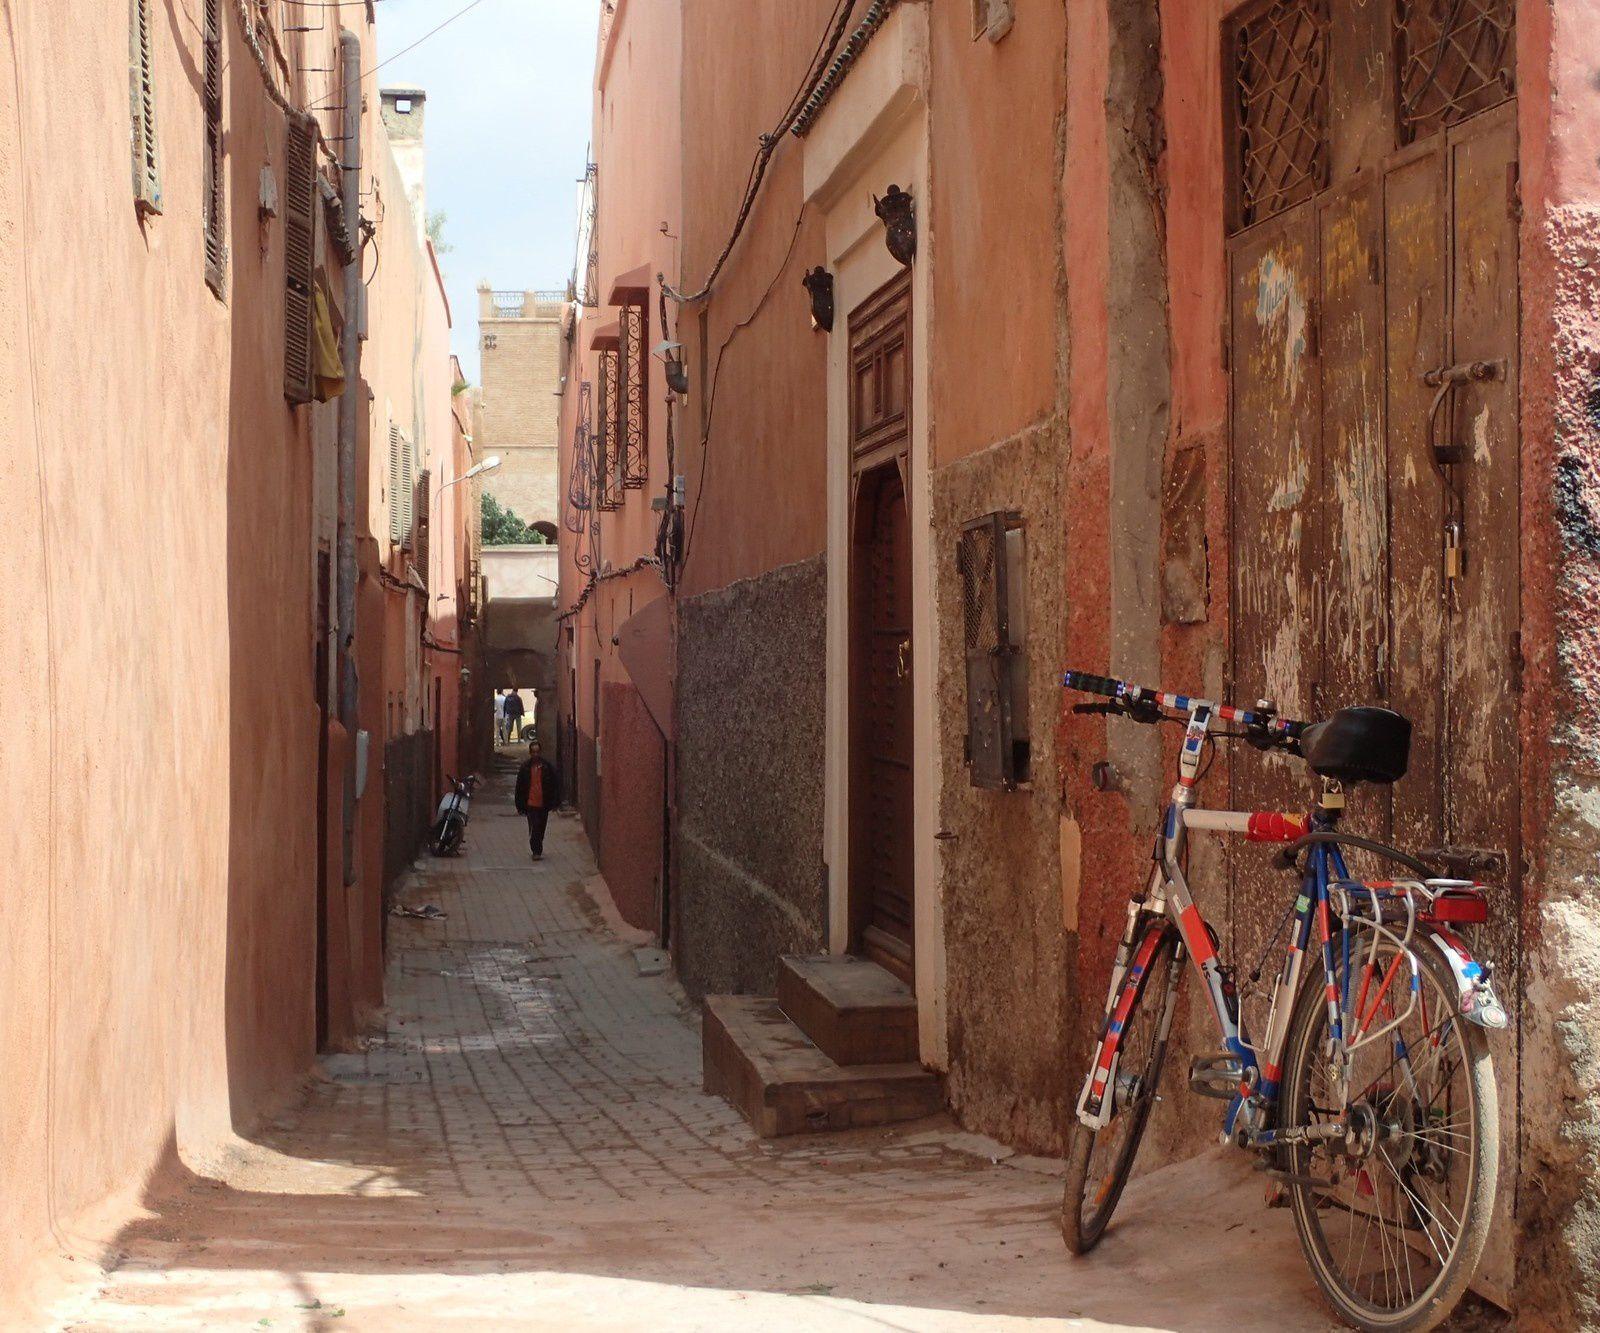 Maroc: Région Marrakech Safi